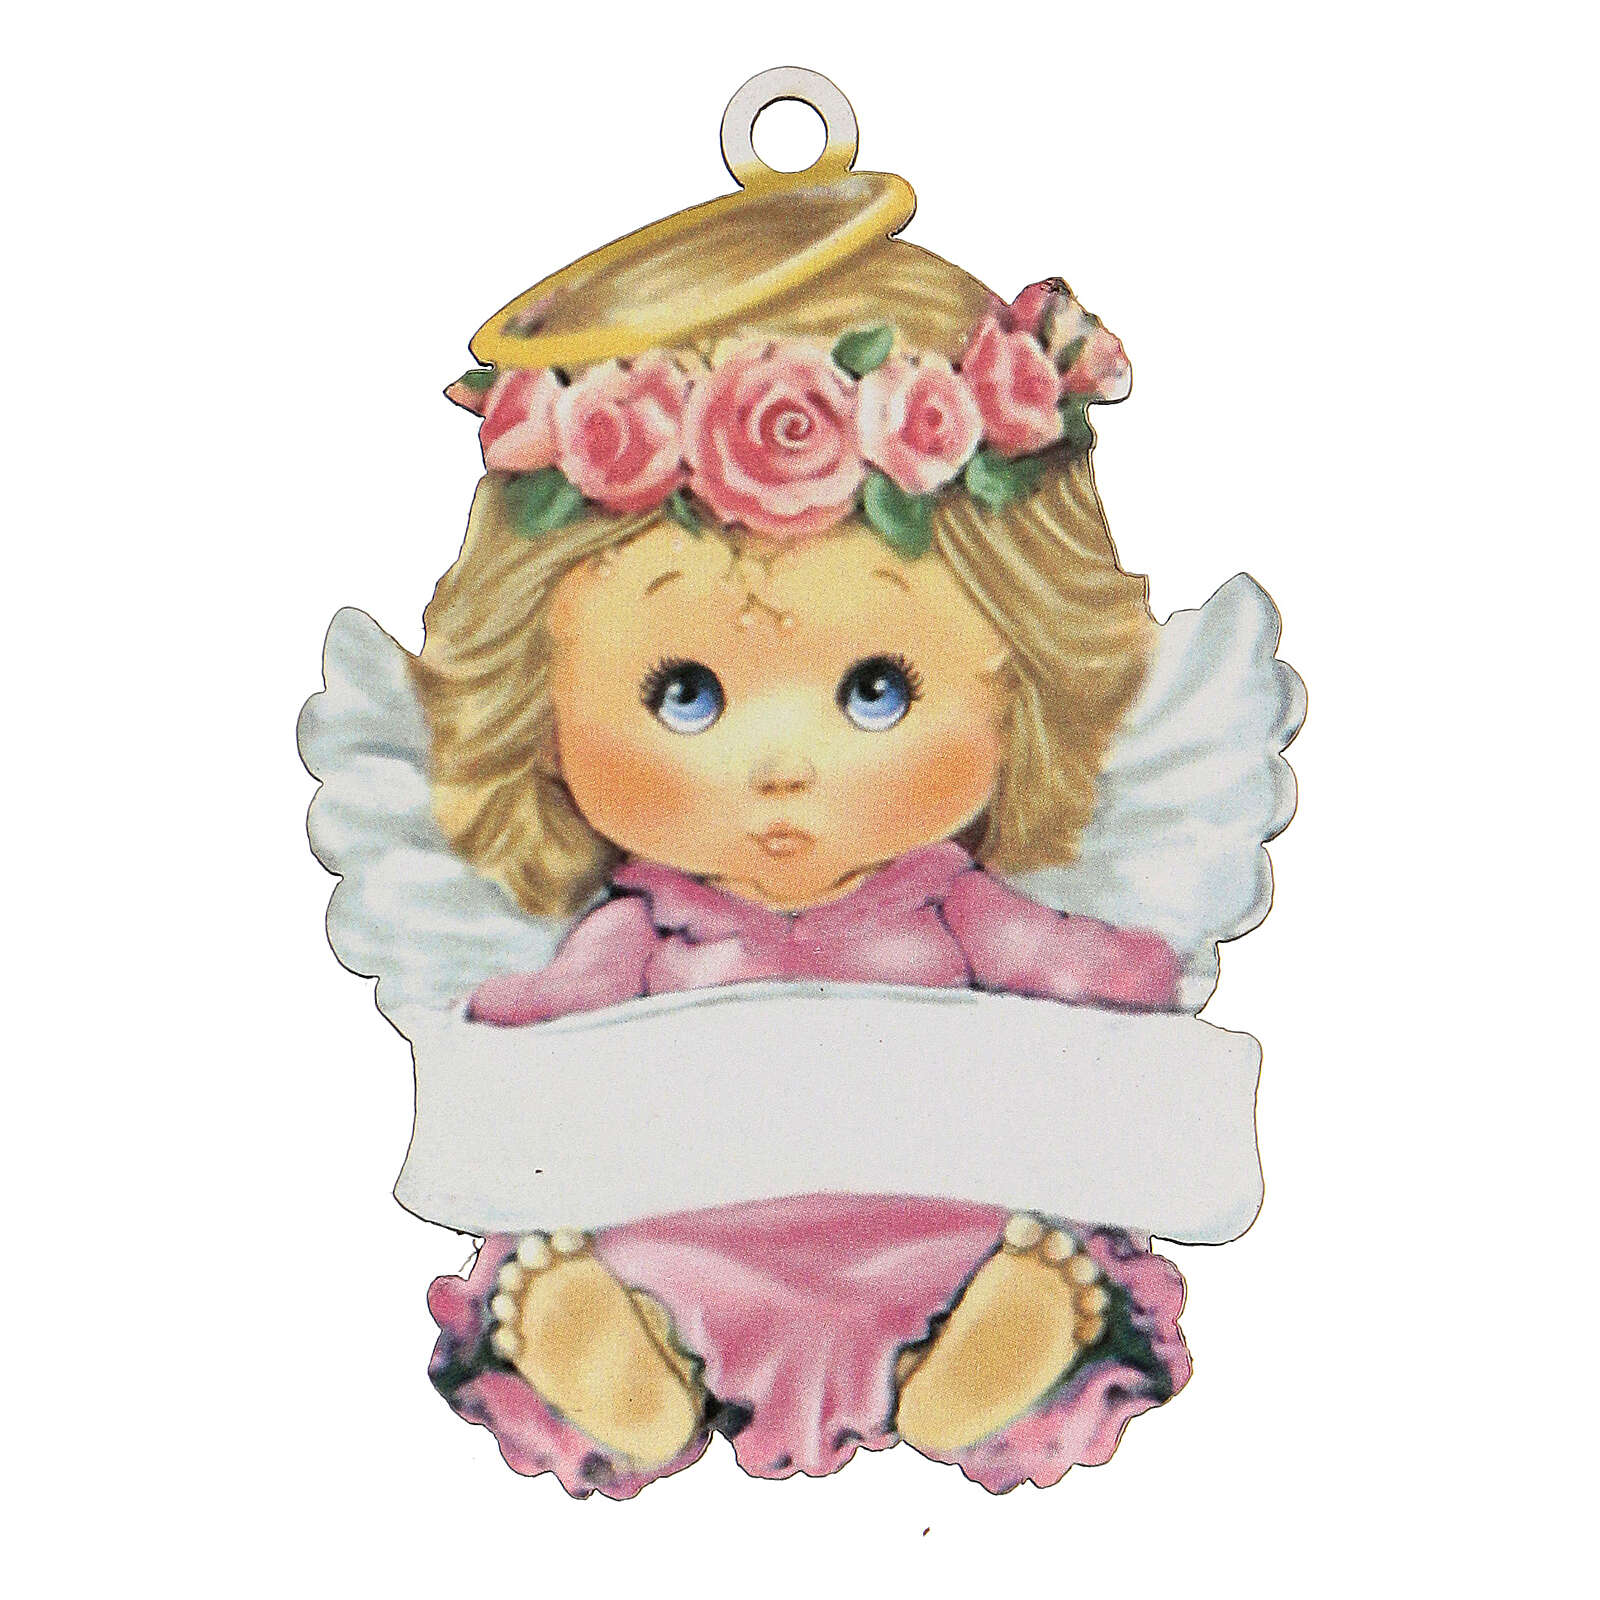 Recuerdo niña ángel 10 cm 3